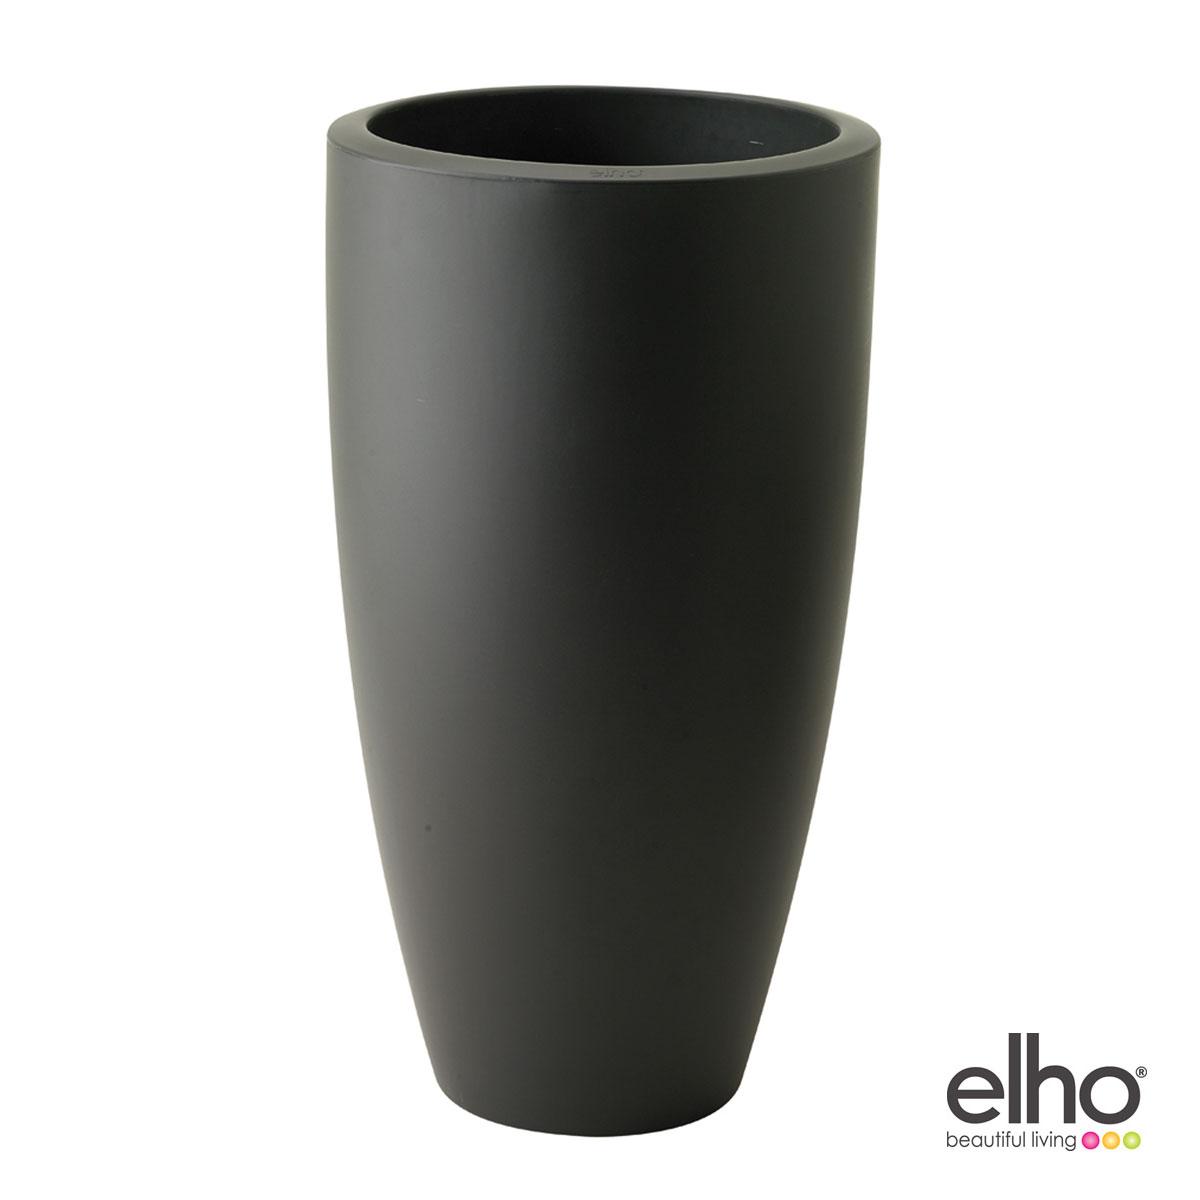 Elho Pure Soft Round High 35 - Pot de fleurs rond haut Ø35 x 62 cm